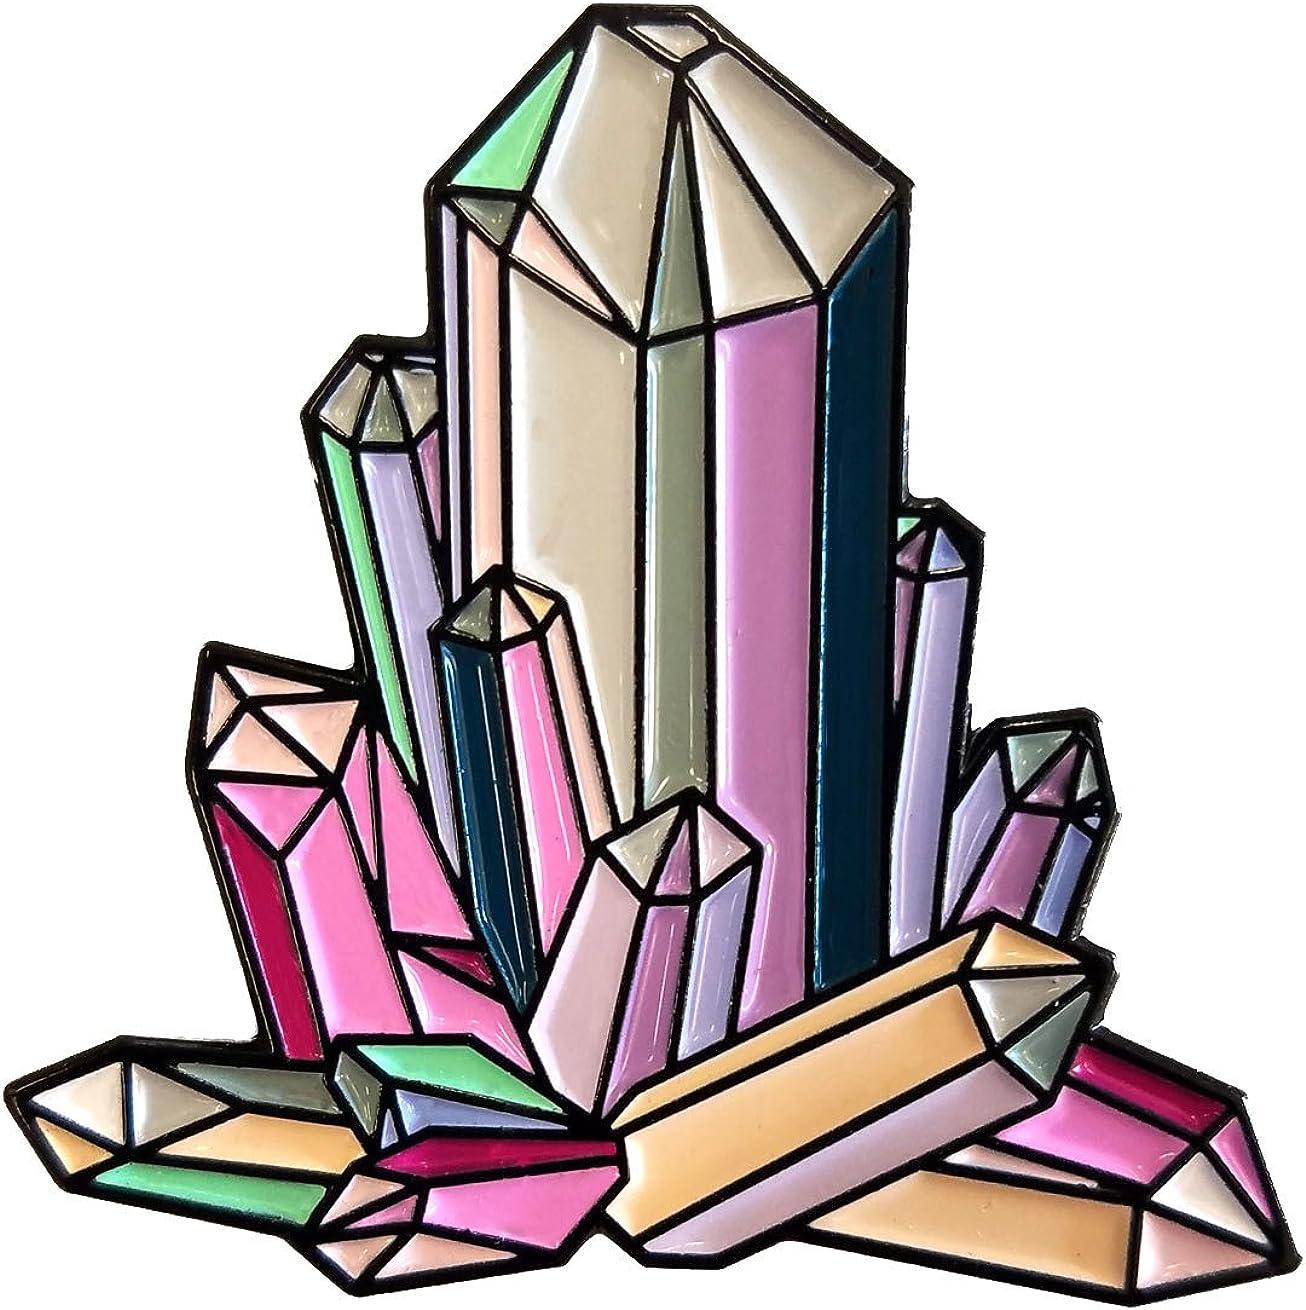 Dark Spark Decals Quartz Crystal Geode Spiritual Wholesale Arlington Mall Cluster 1 Peace